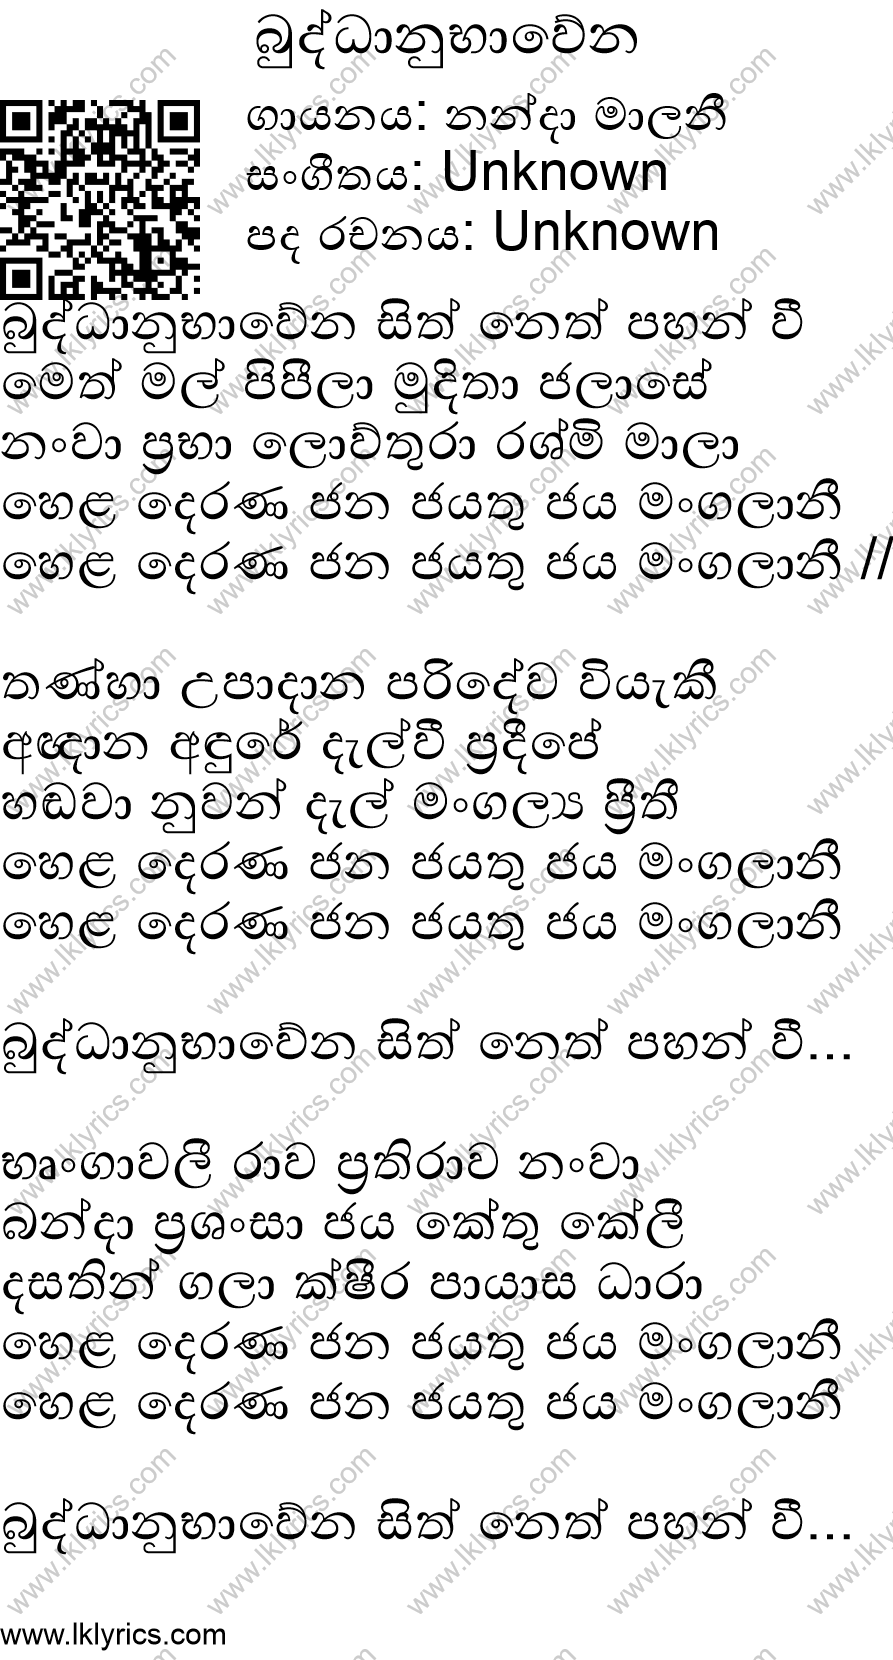 buddhanu baawena lyrics